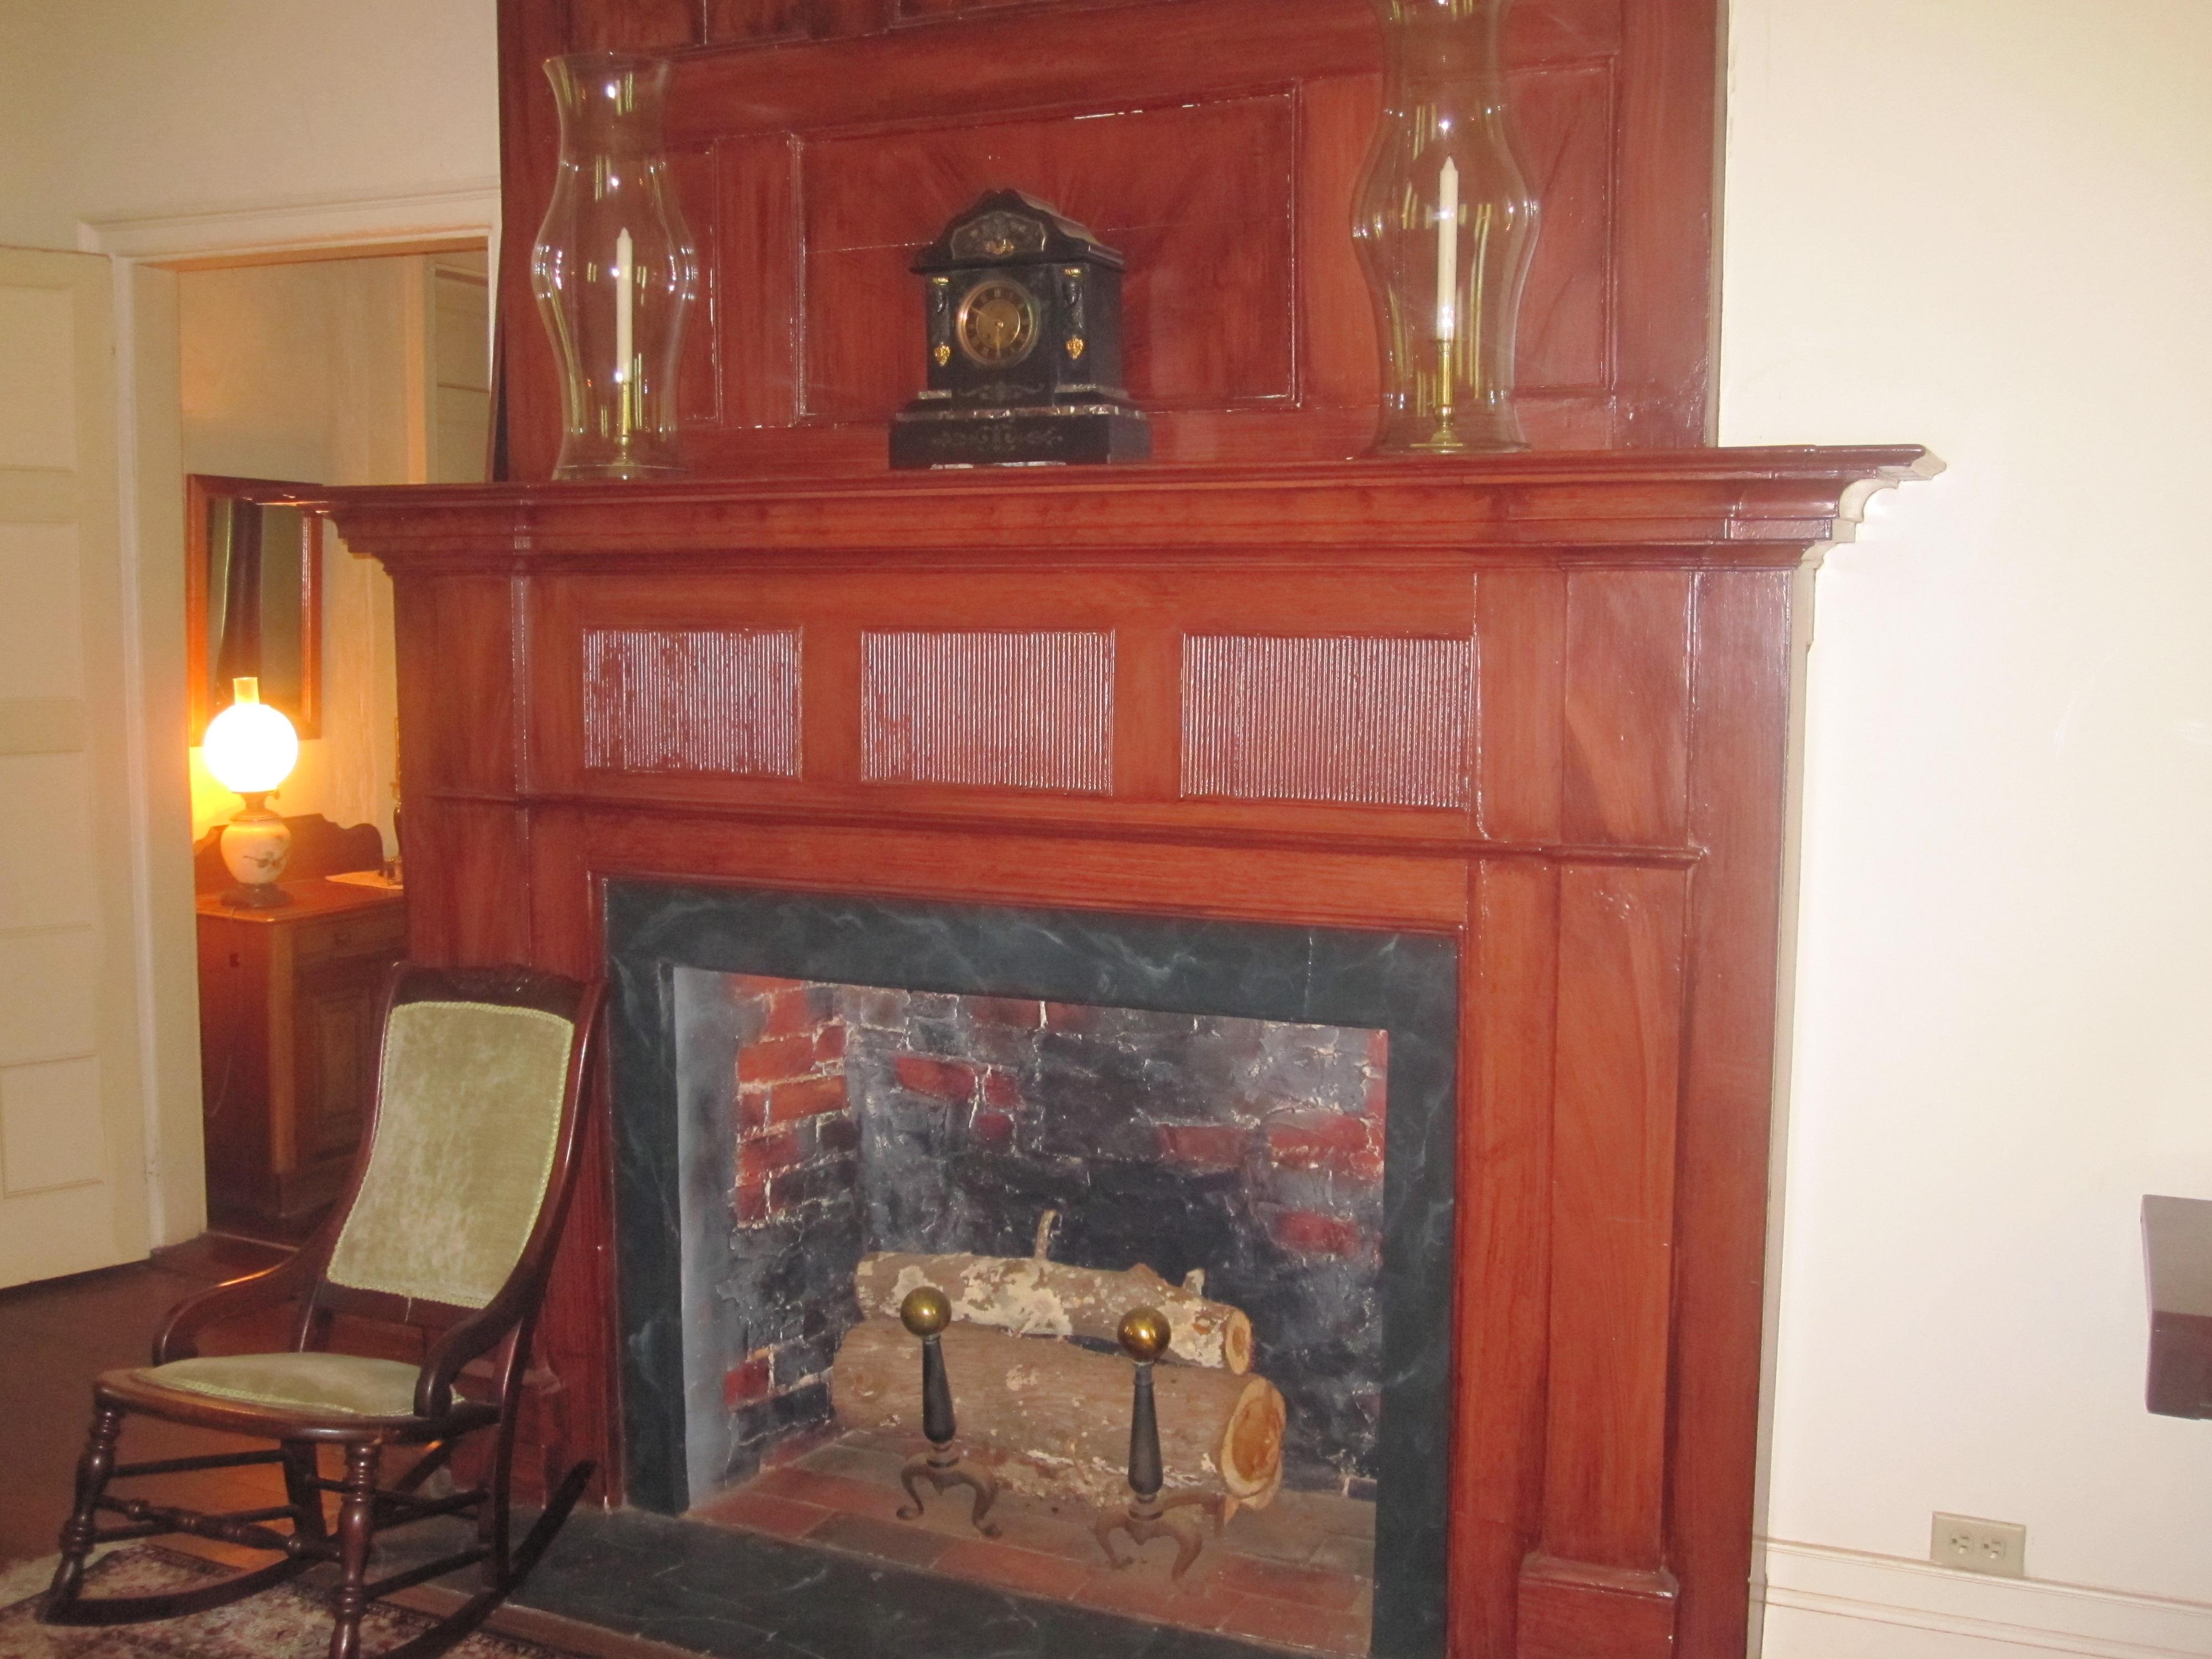 File:Fireplace at Melrose Plantation IMG 3457.JPG - Wikimedia Commons